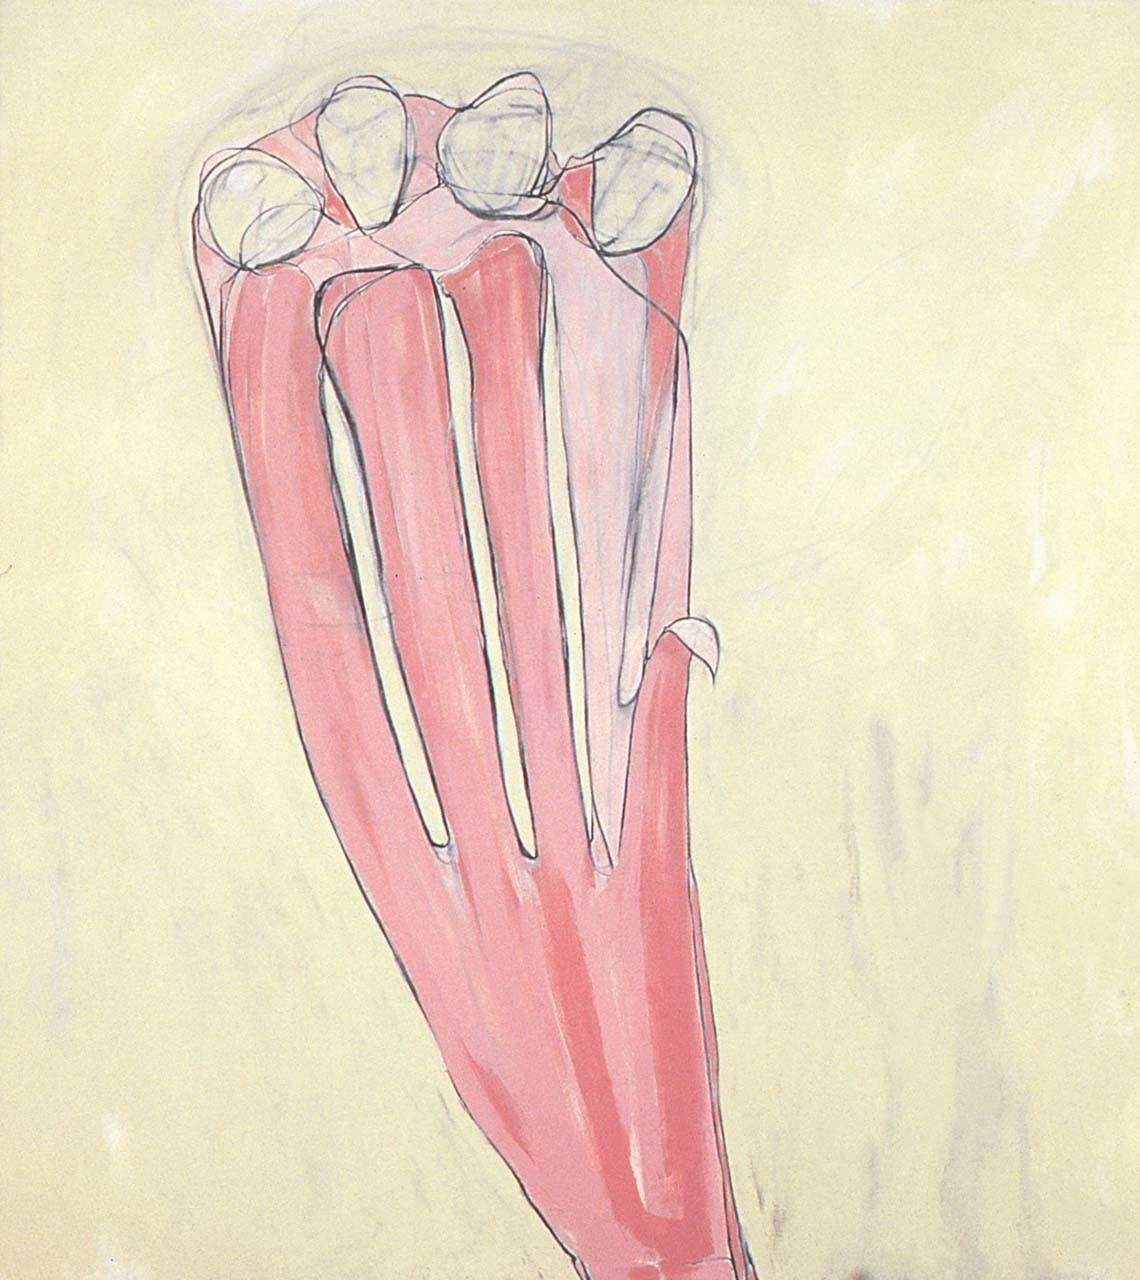 "<div class=""artwork_caption""><p>Fingernails, 1999</p></div>"